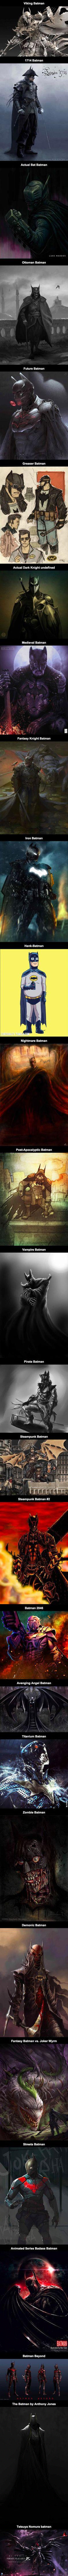 Here is what Batman would look like in alternate universes.